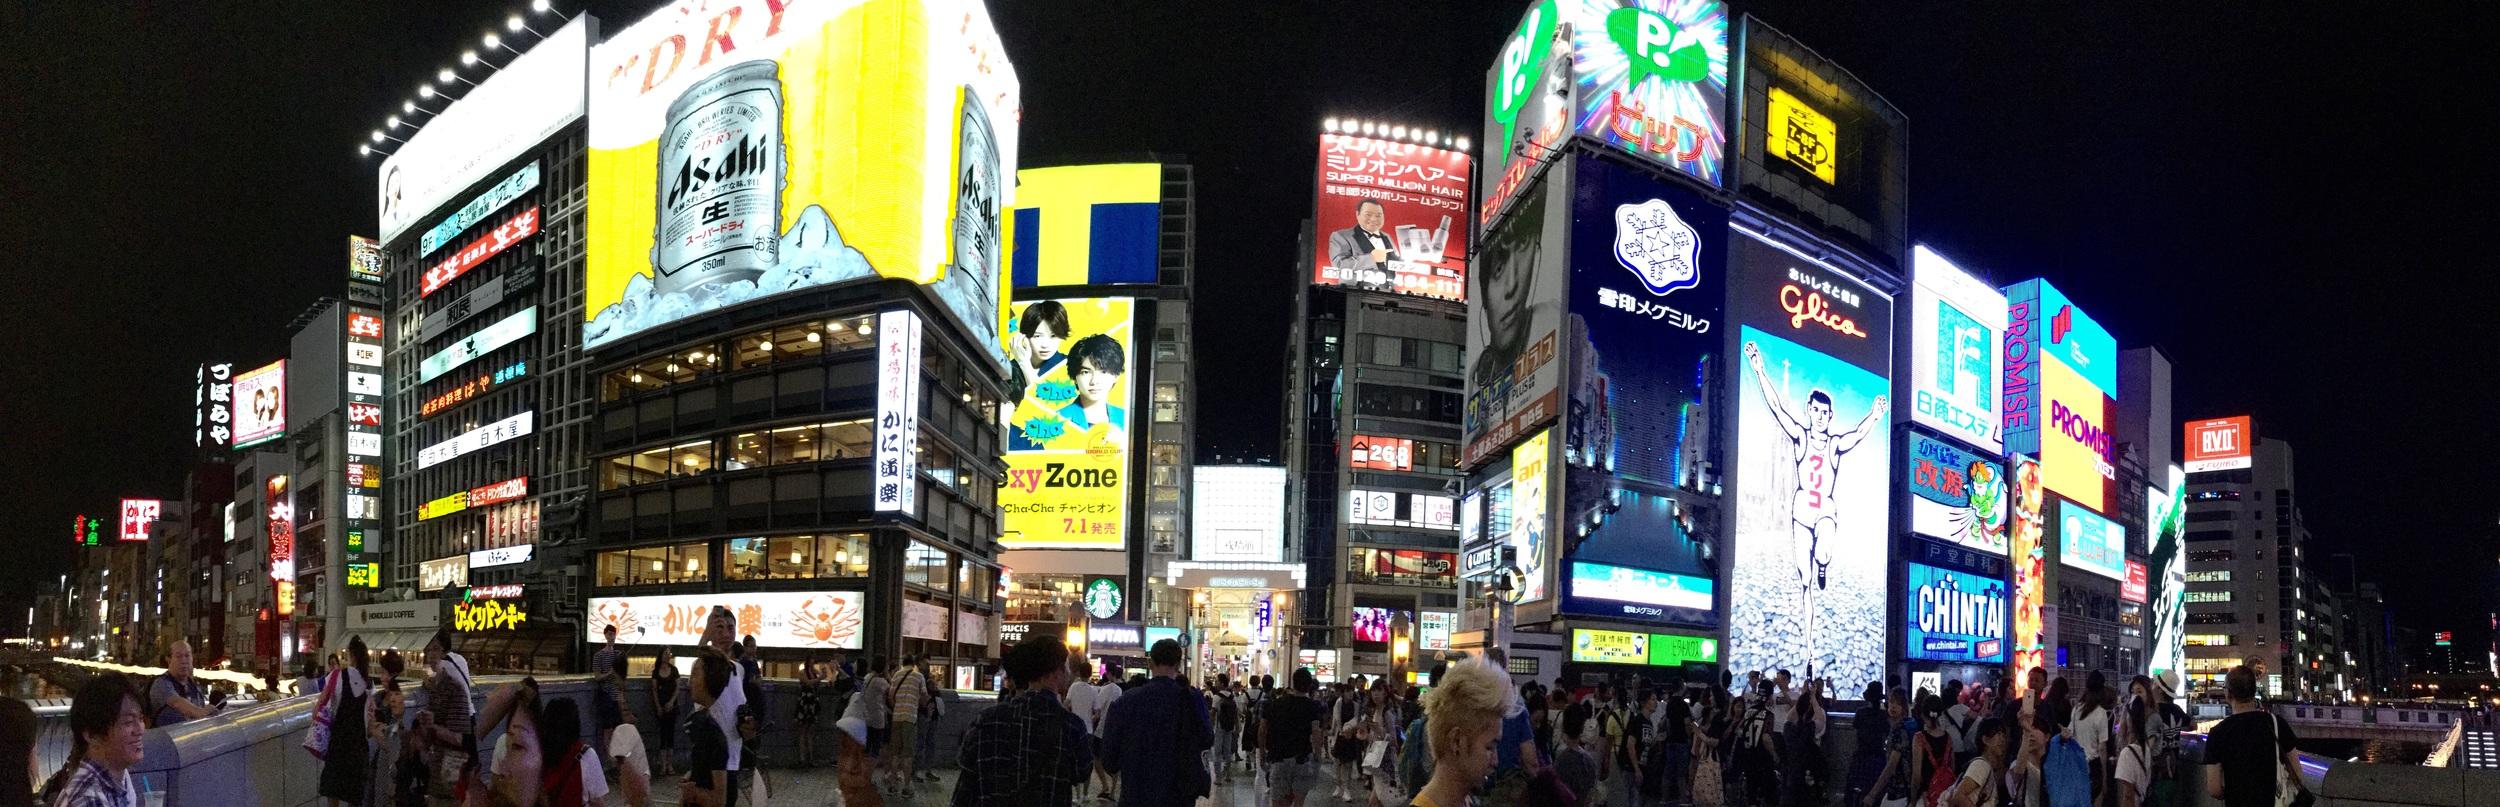 Osaka's towering advertisements.